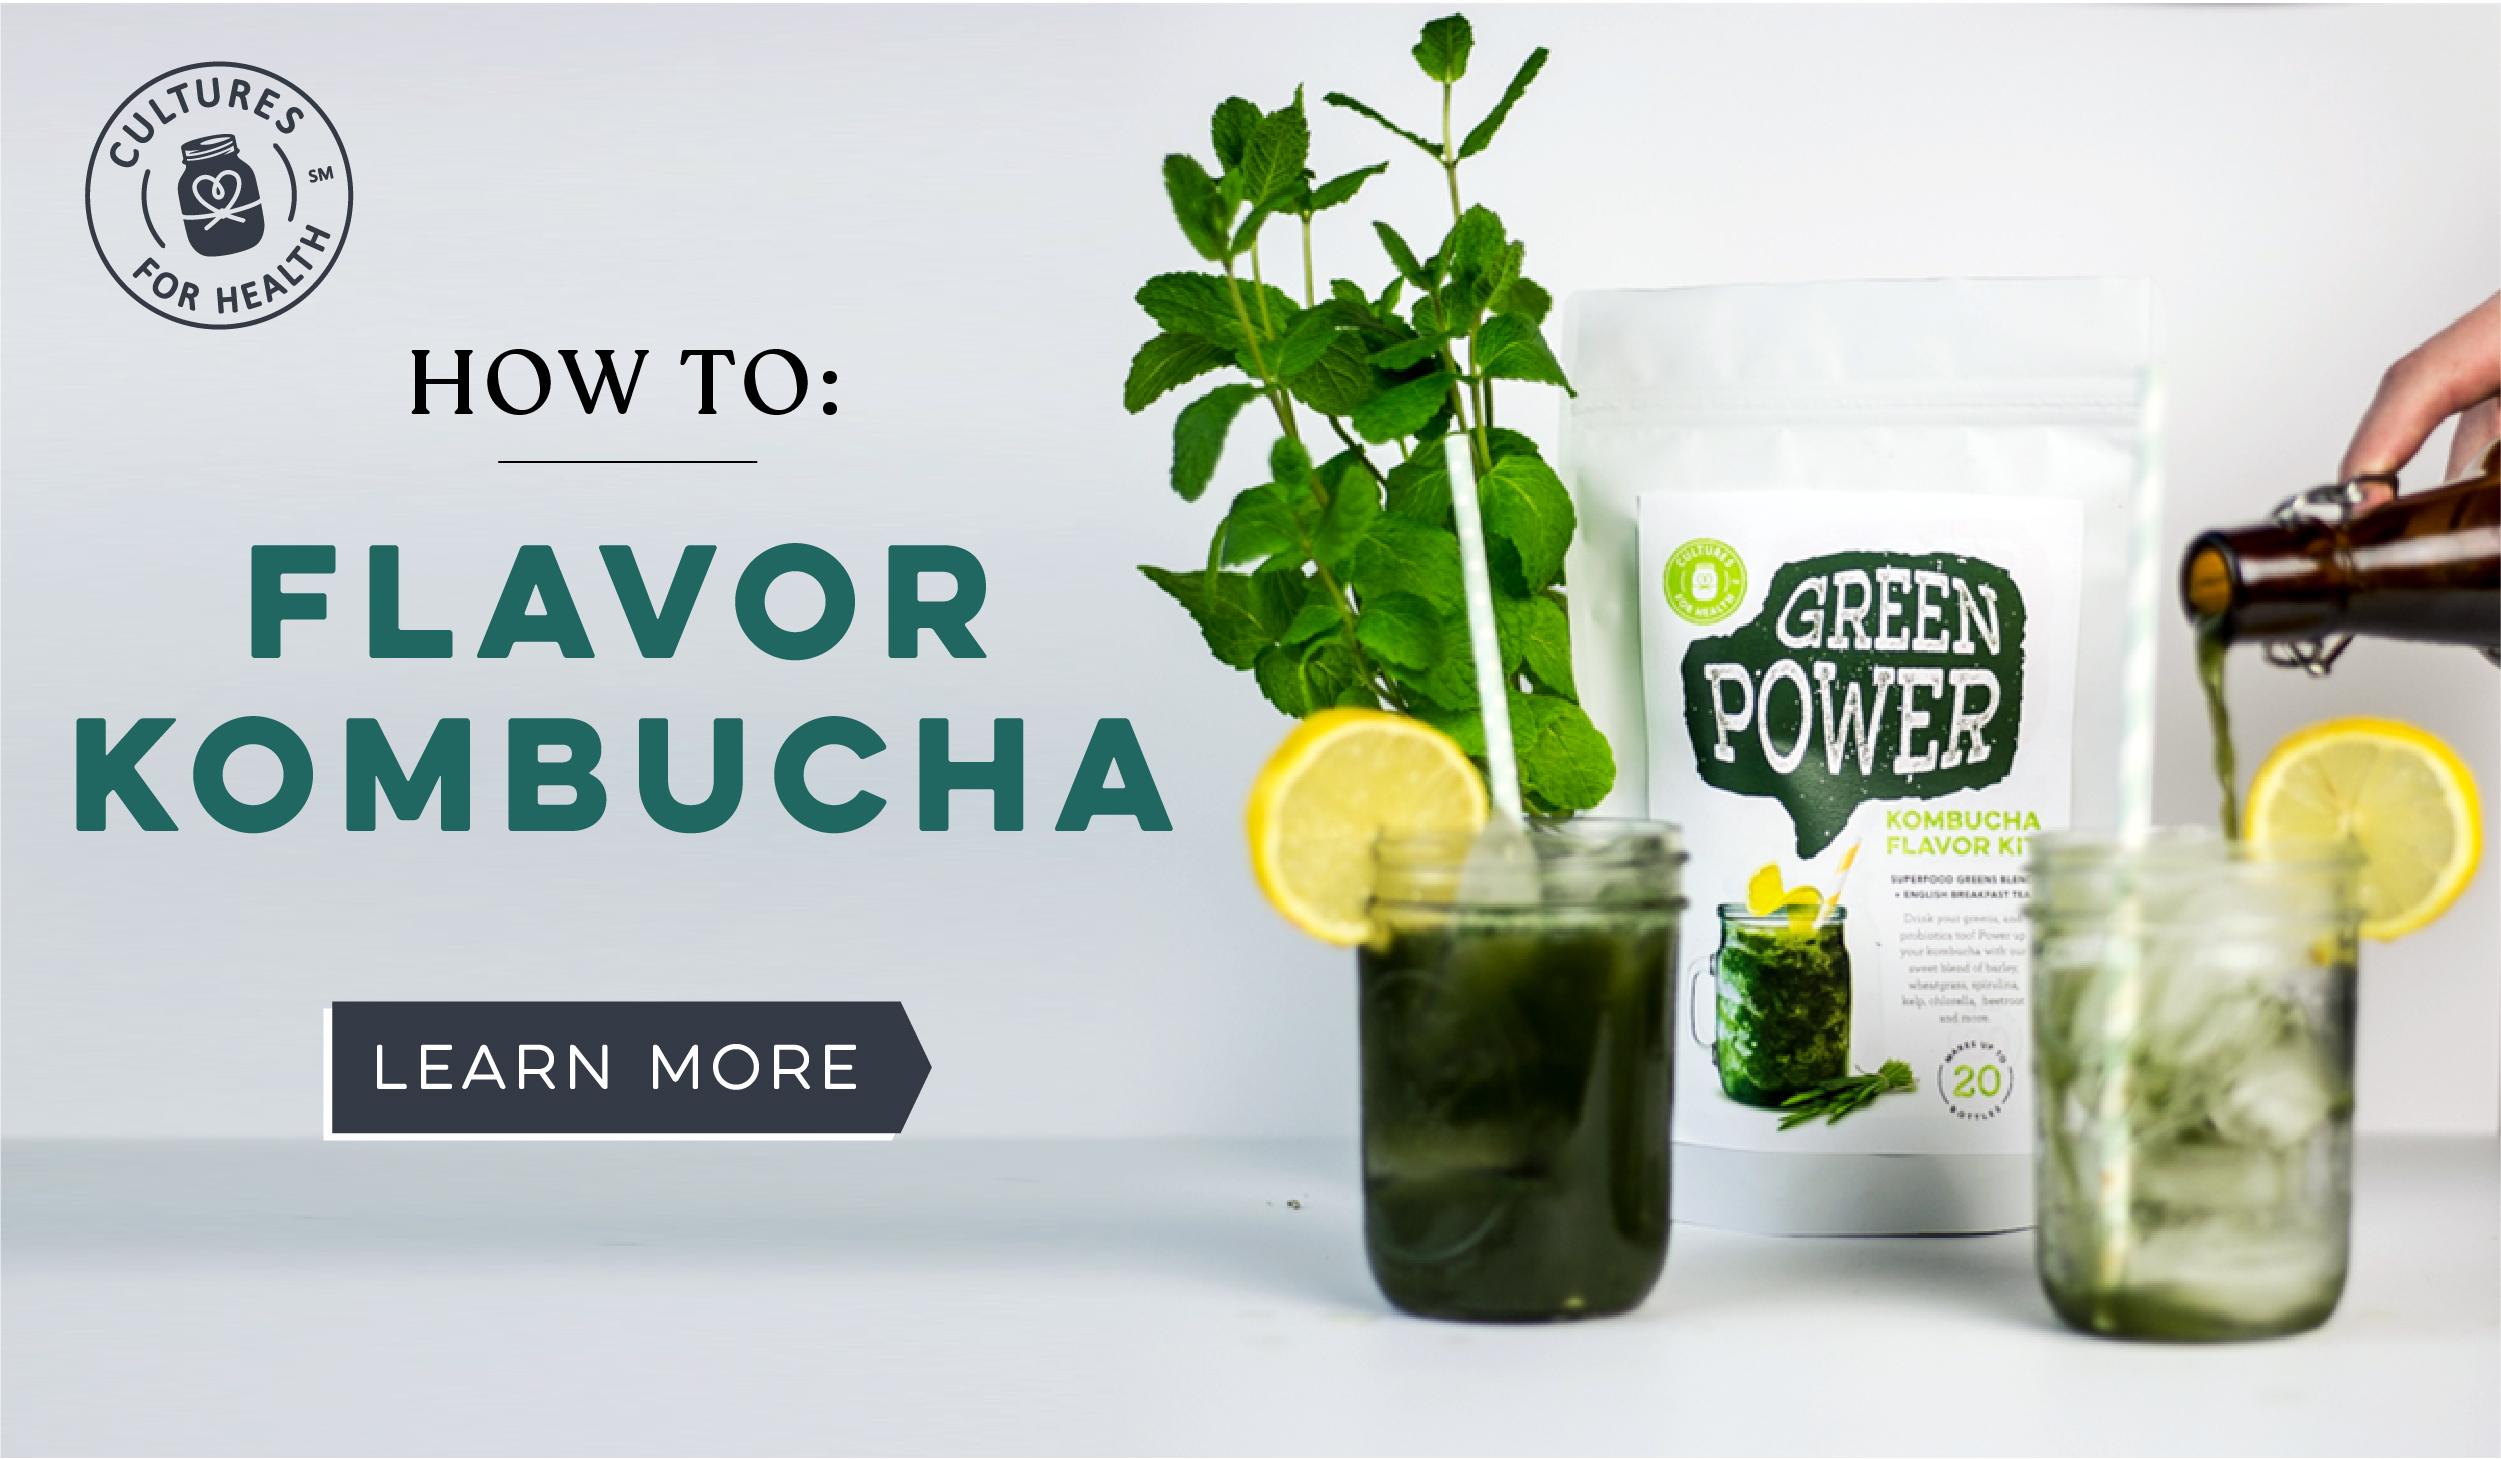 How to Flavor Kombucha